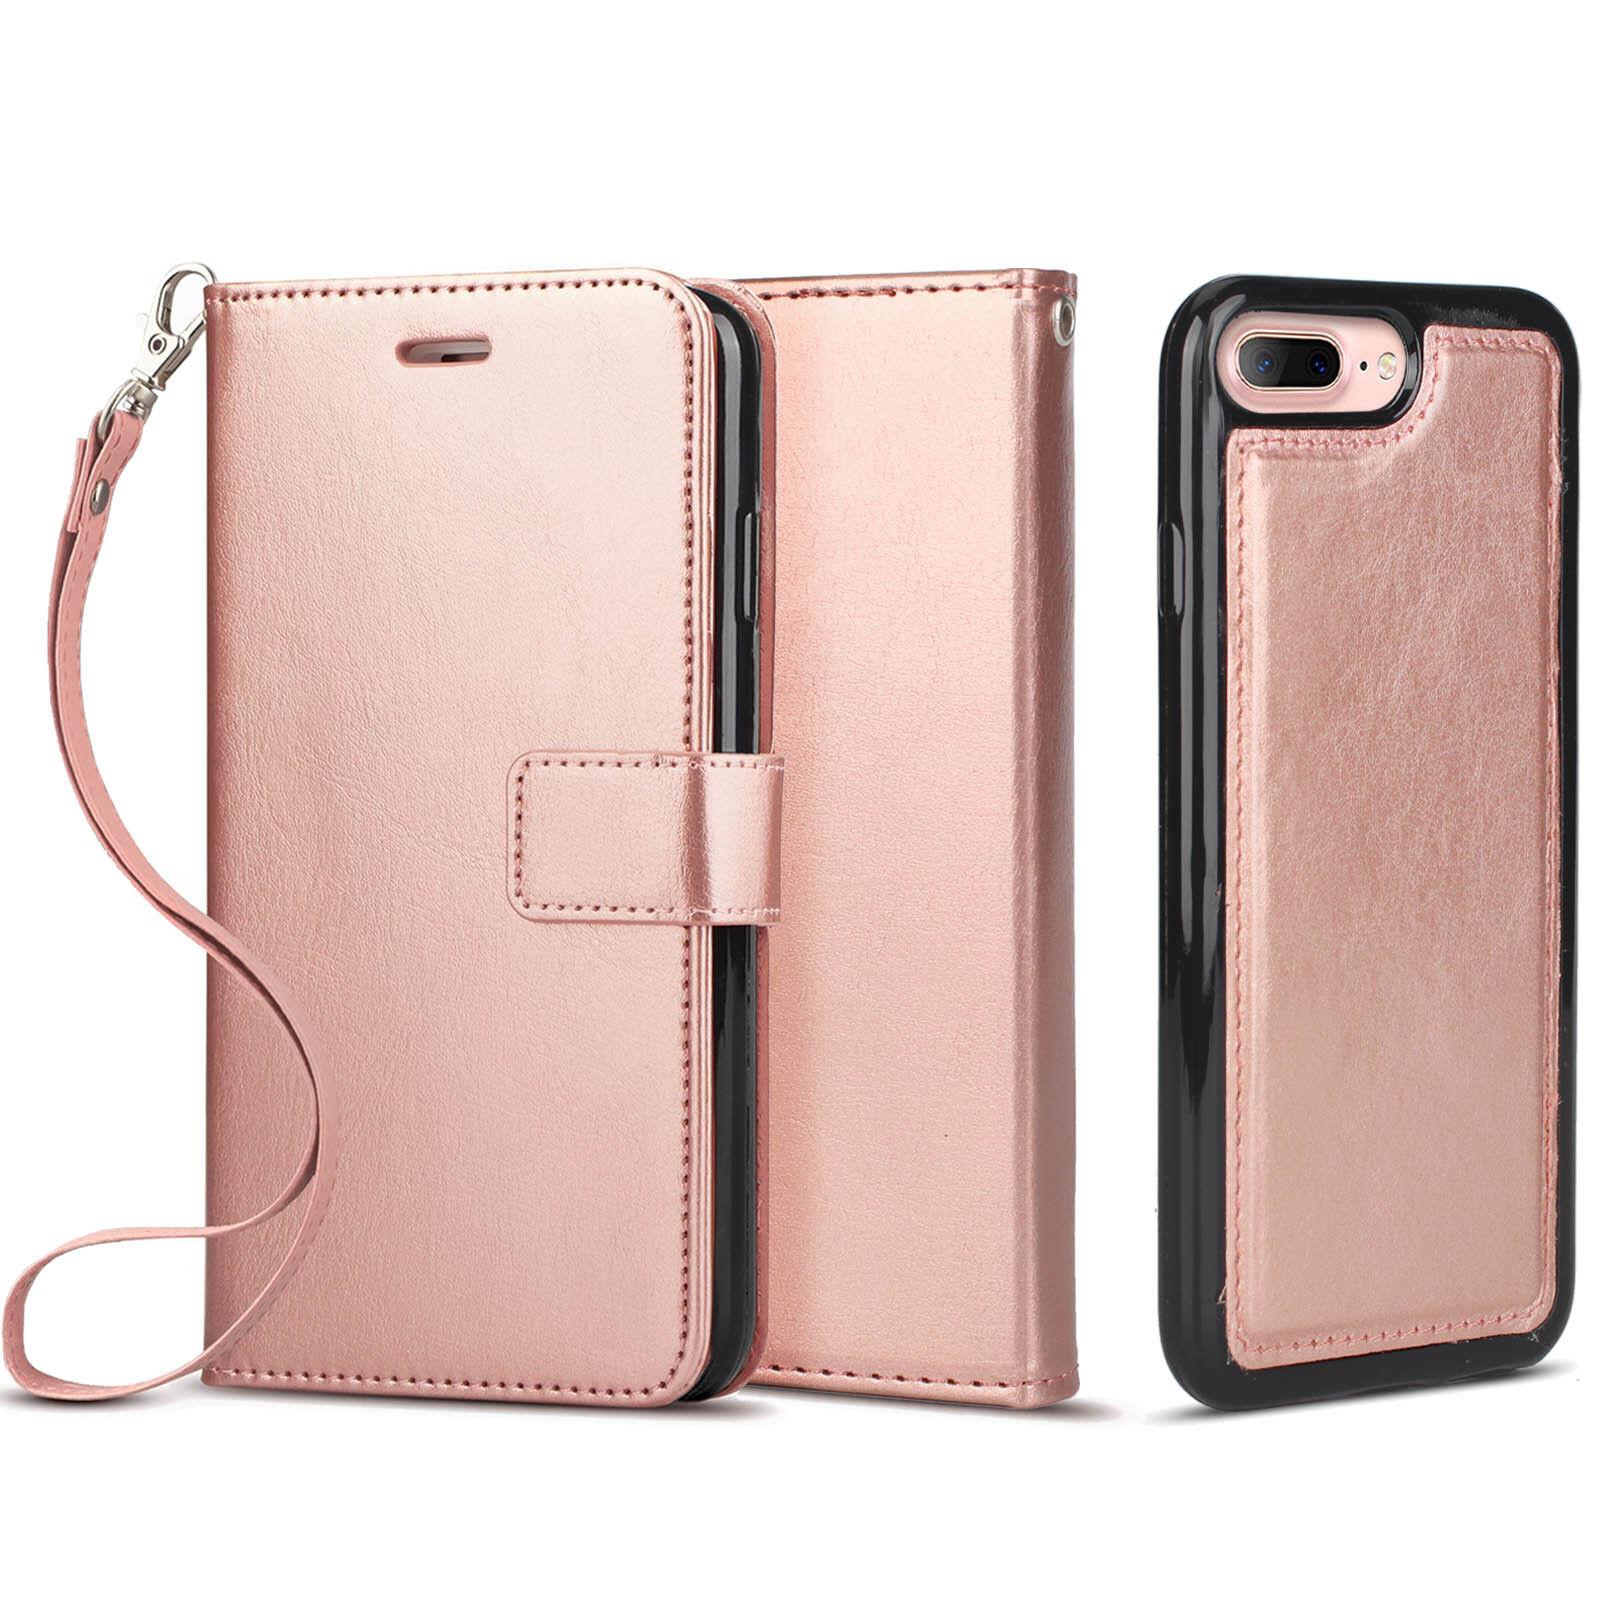 Luxury Leather Book Purse Women Handbag Wallet Case Cover Ba